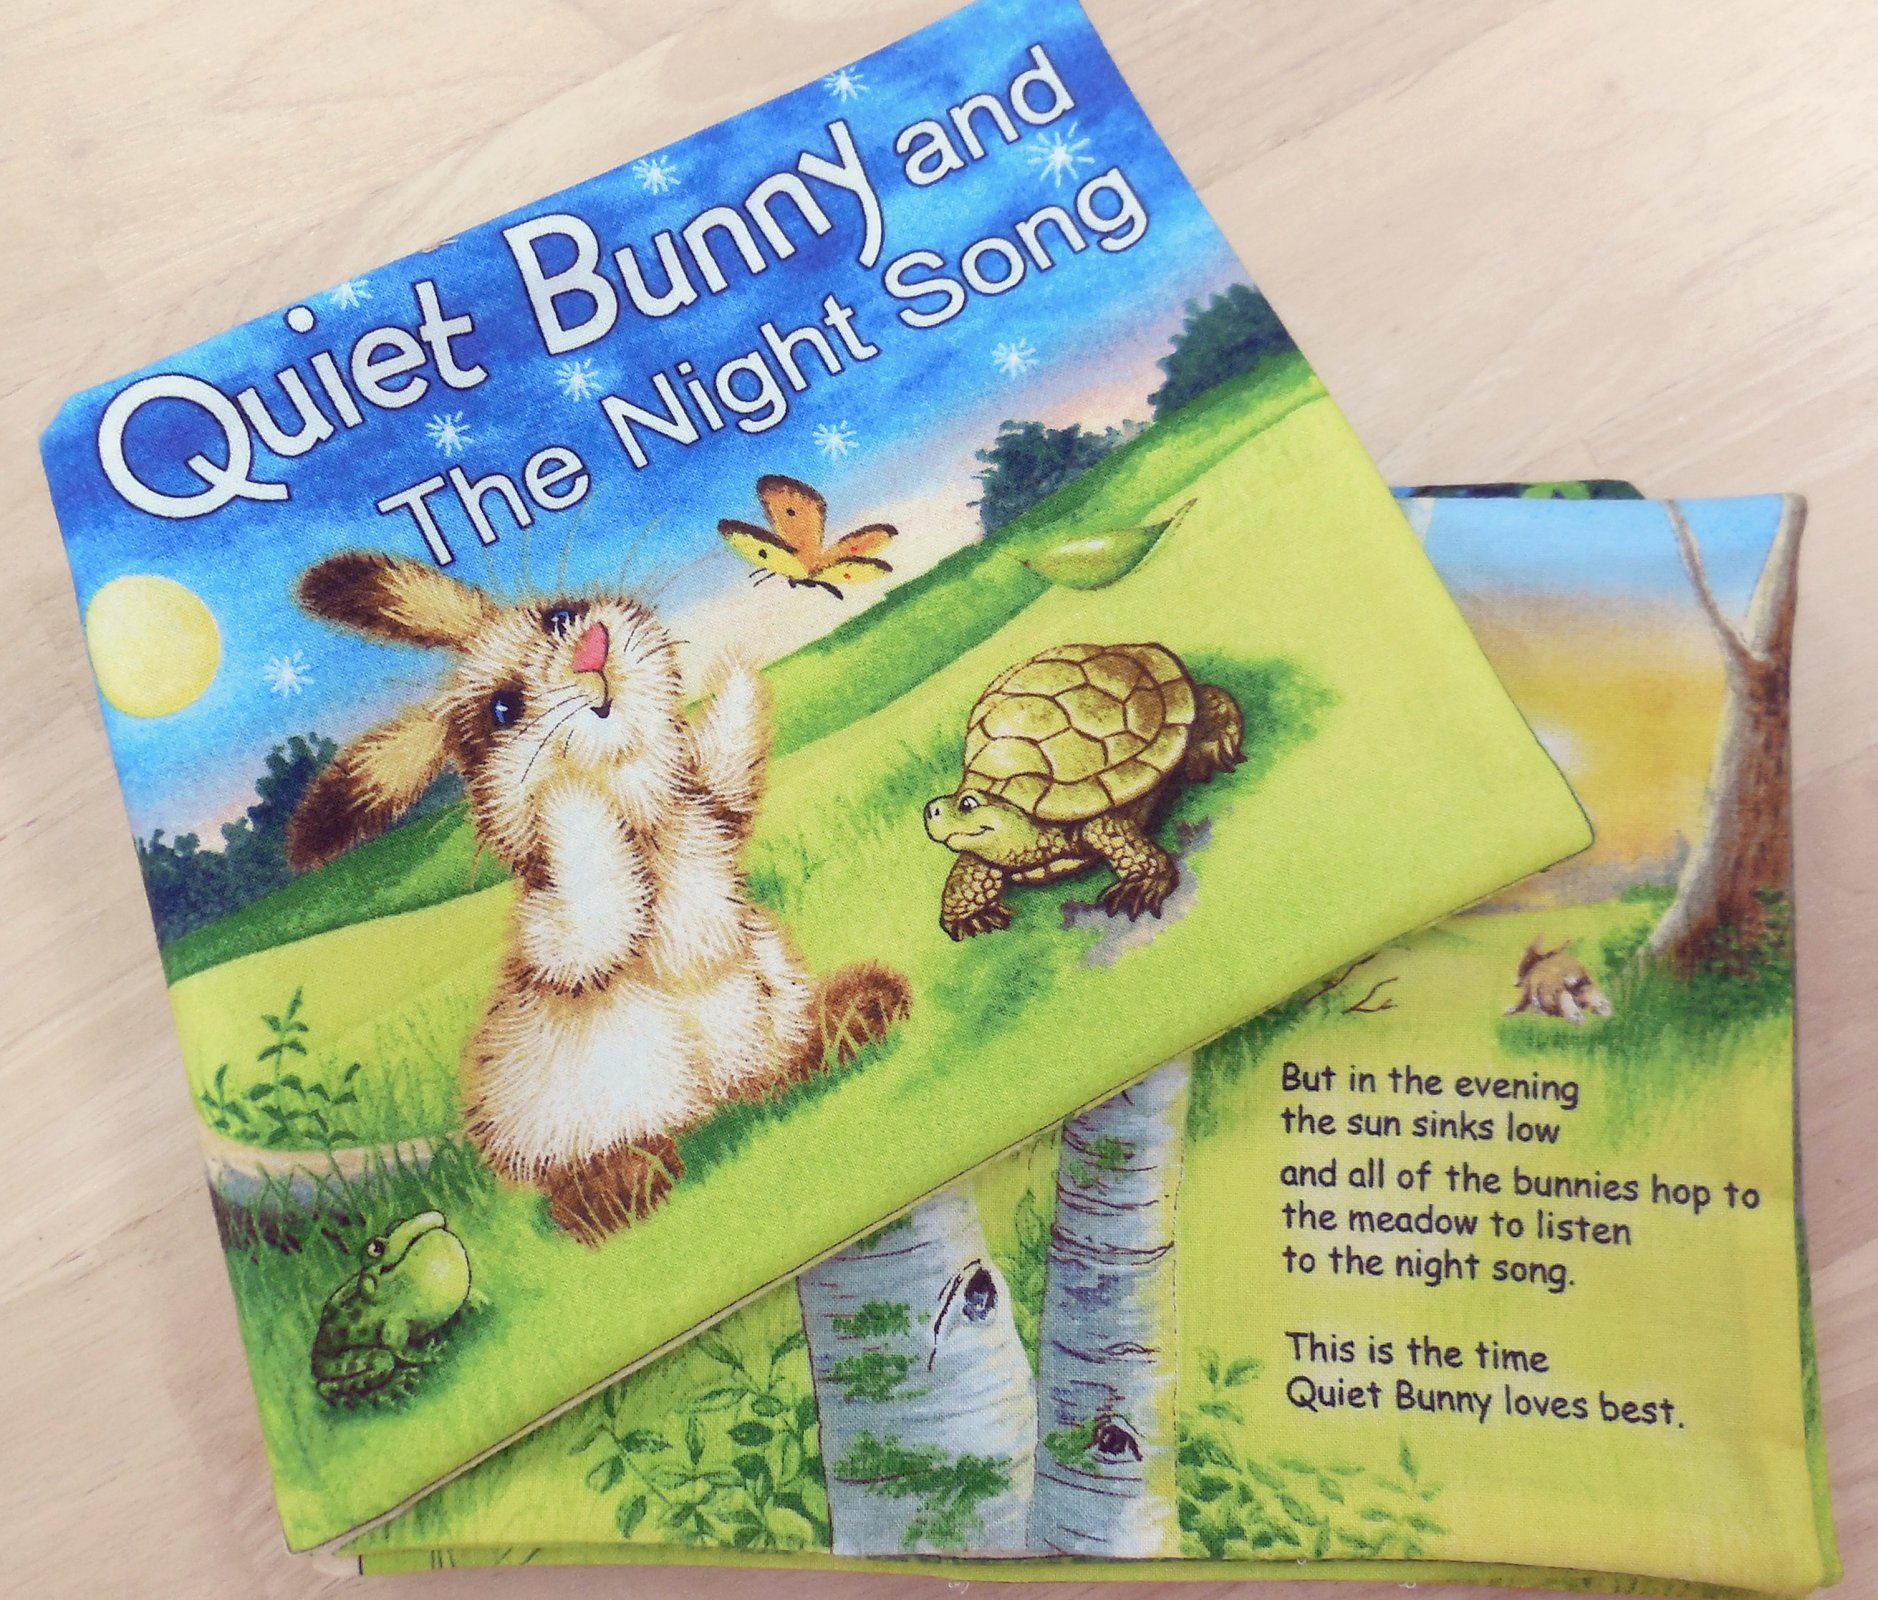 Quilt Fabric, Patterns & Kits in Aurora Orgeon | Speckled Hen Quilts : speckled hen quilt shop - Adamdwight.com